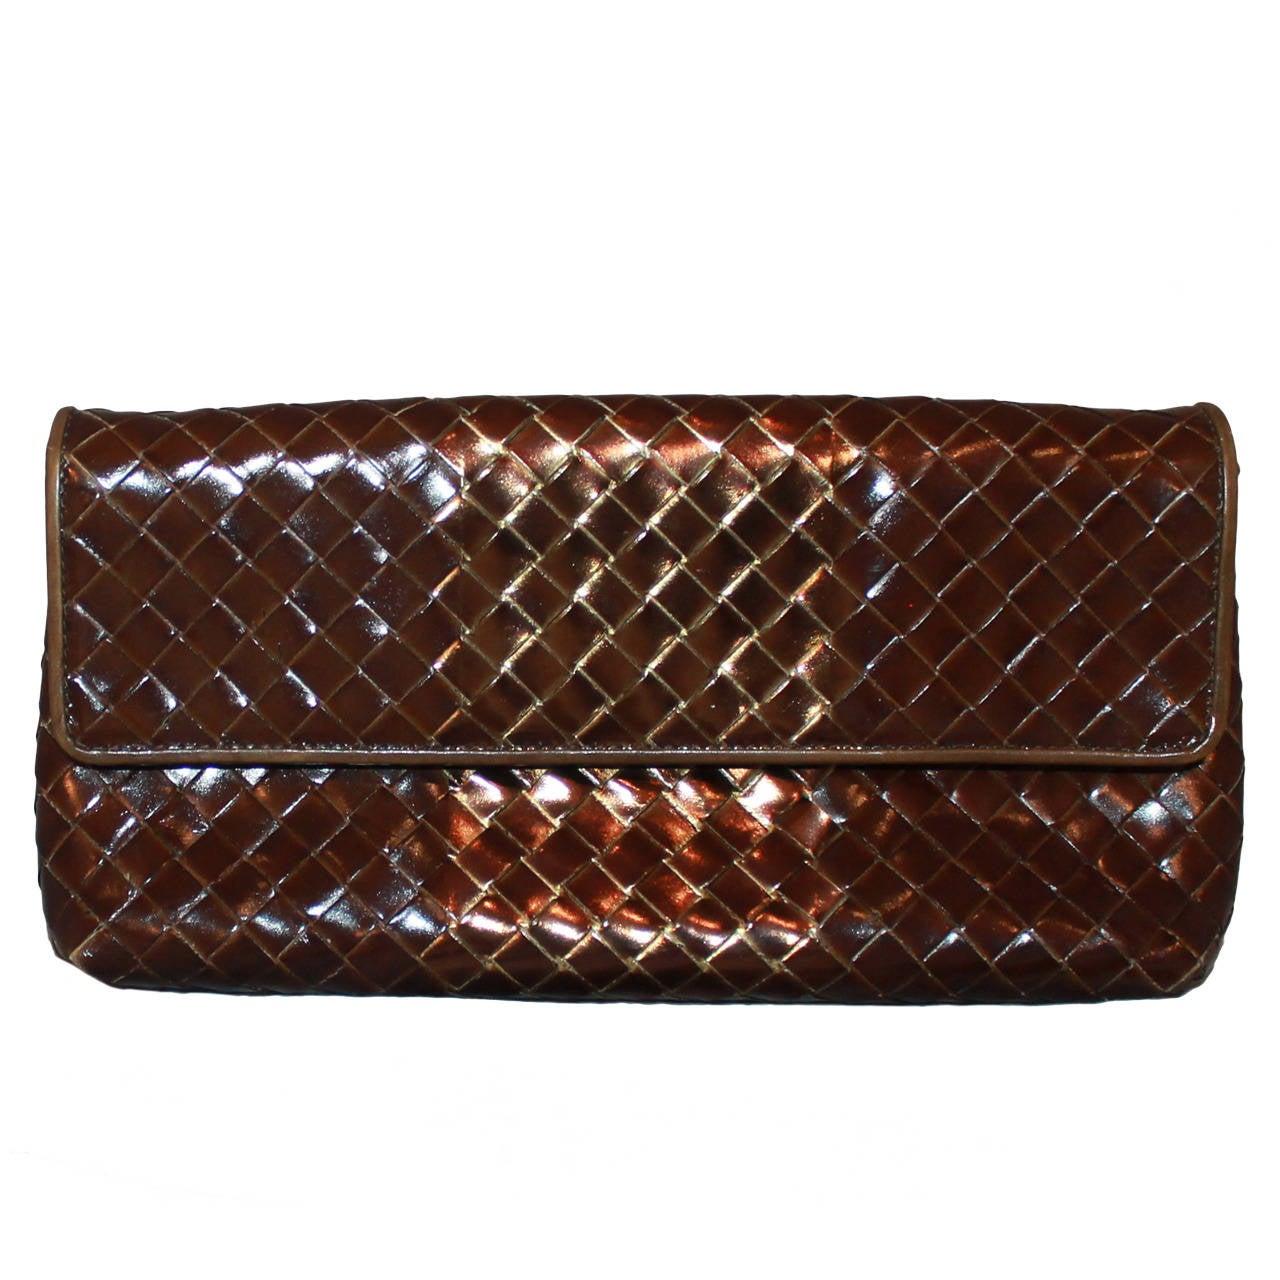 Bottega Veneta Bronze & Brown Braided Leather Clutch 1